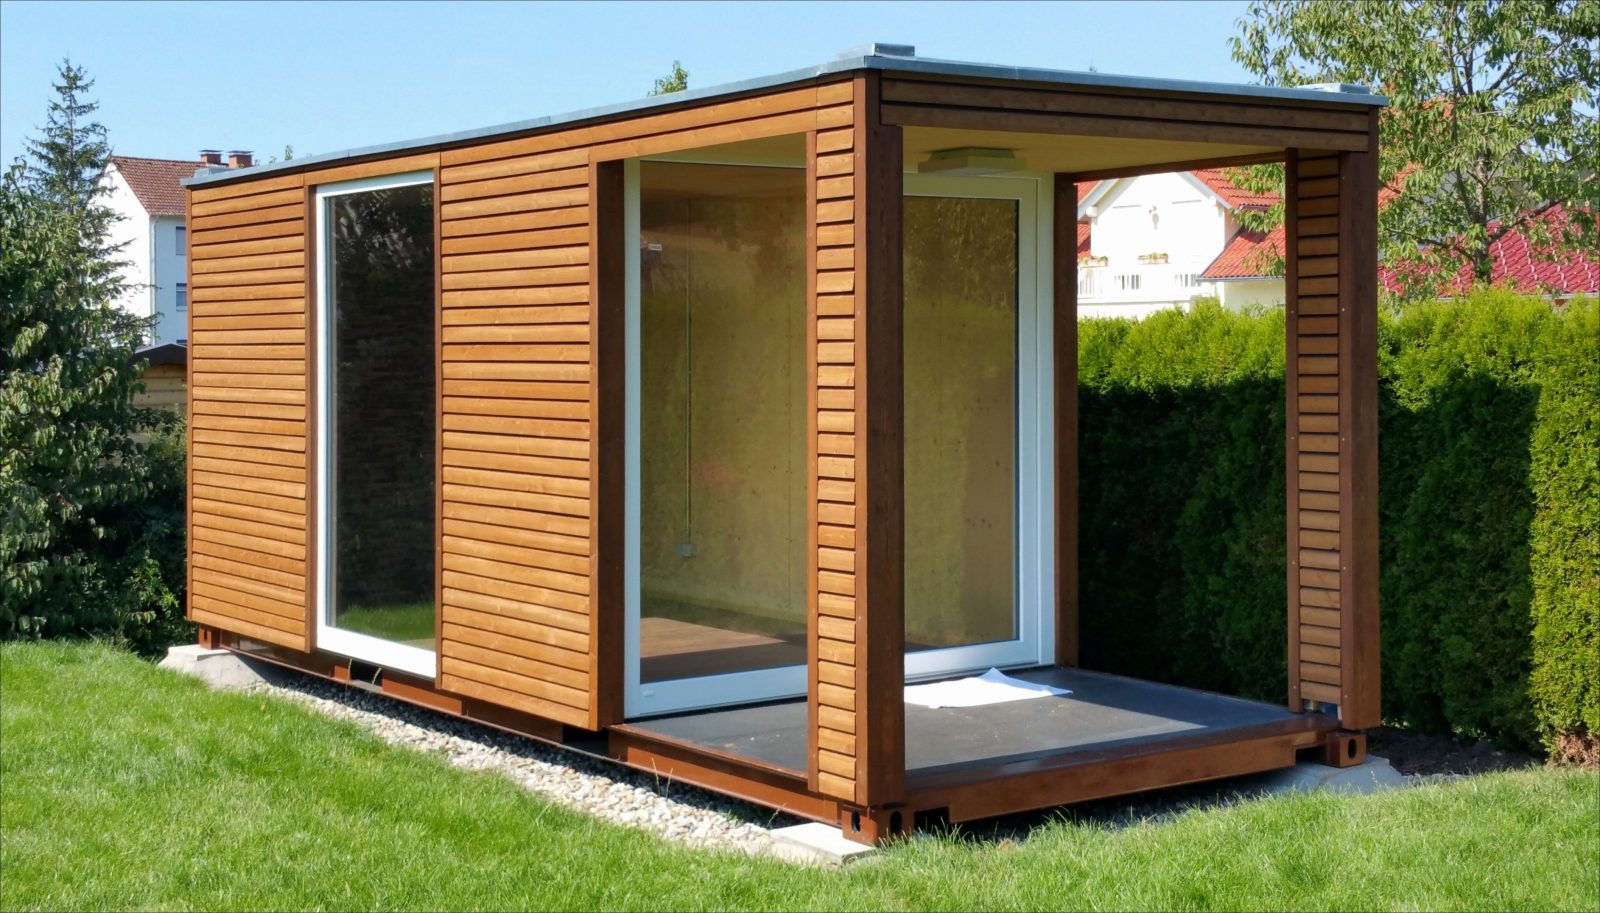 gartenhaus modern selber bauen haus design ideen. Black Bedroom Furniture Sets. Home Design Ideas